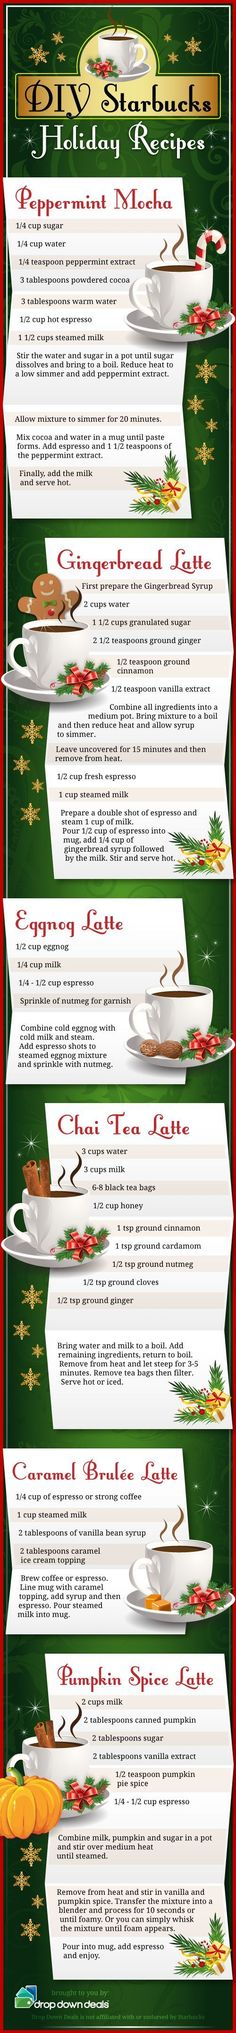 Starbucks Holiday Recipes